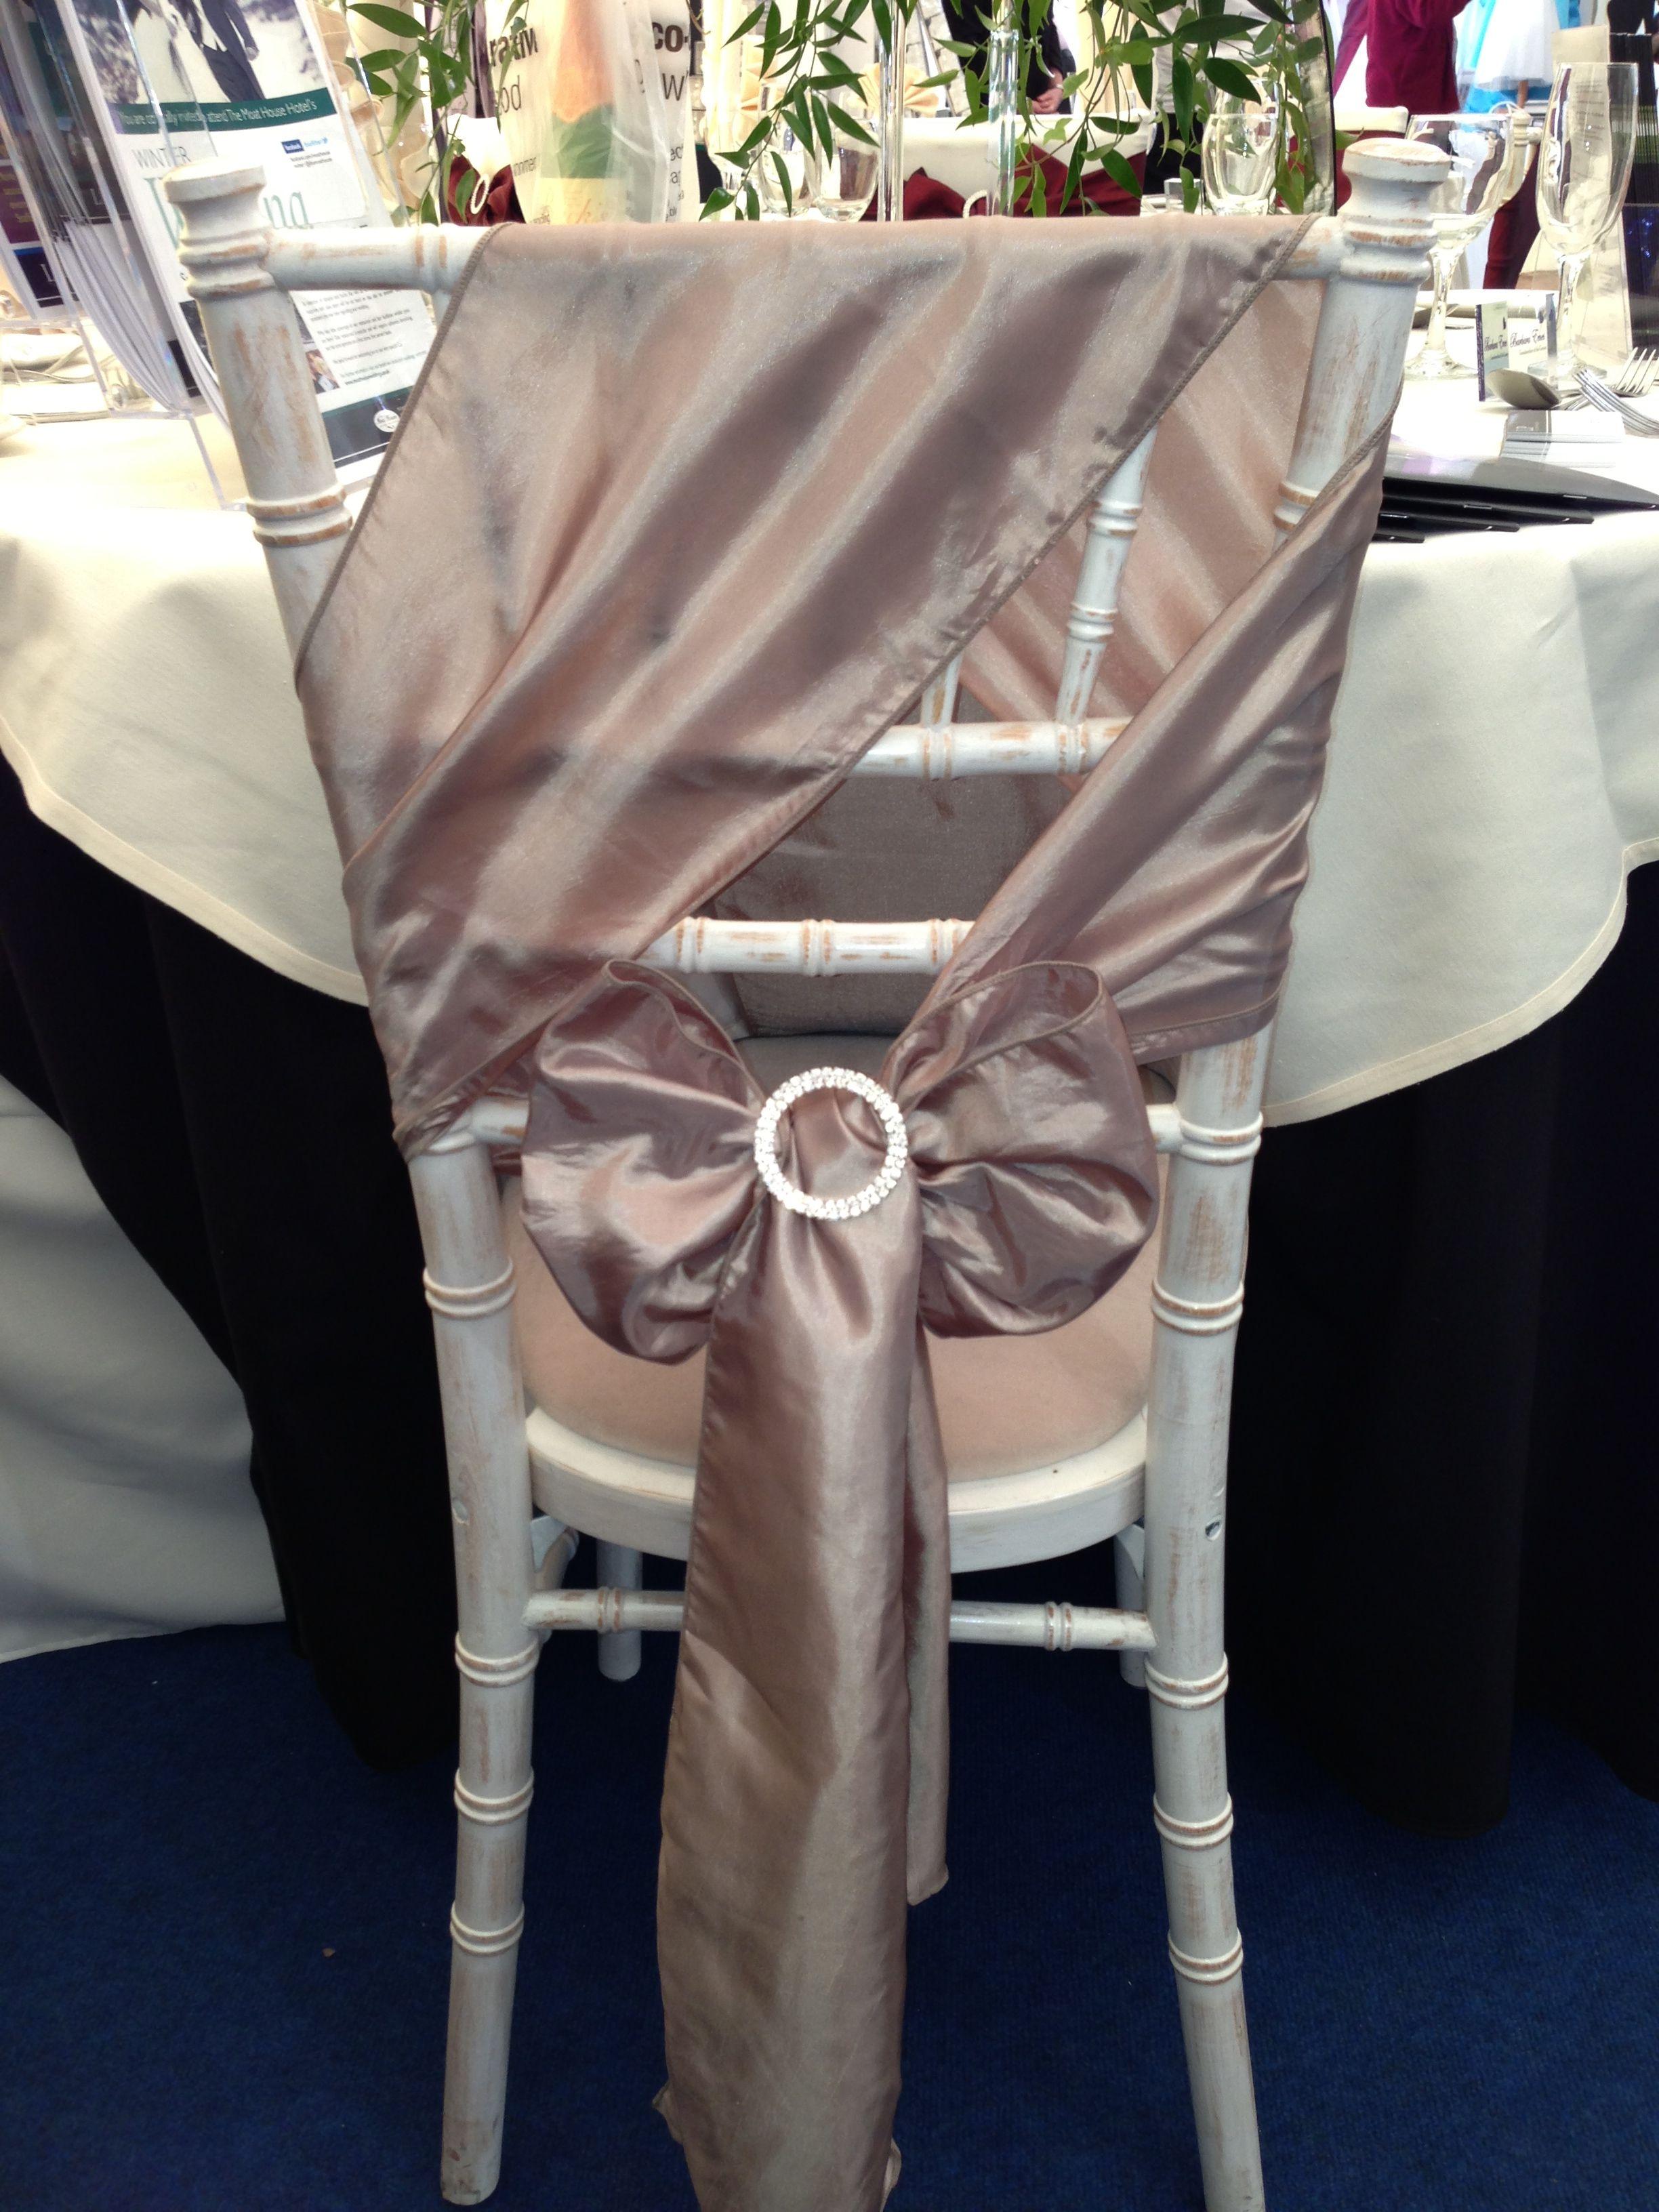 Anna Chair Cover & Wedding Linens Rental Burnaby Bc Grey Parson Slipcovers Chiavari Chairs Sash Wheat Taffeta